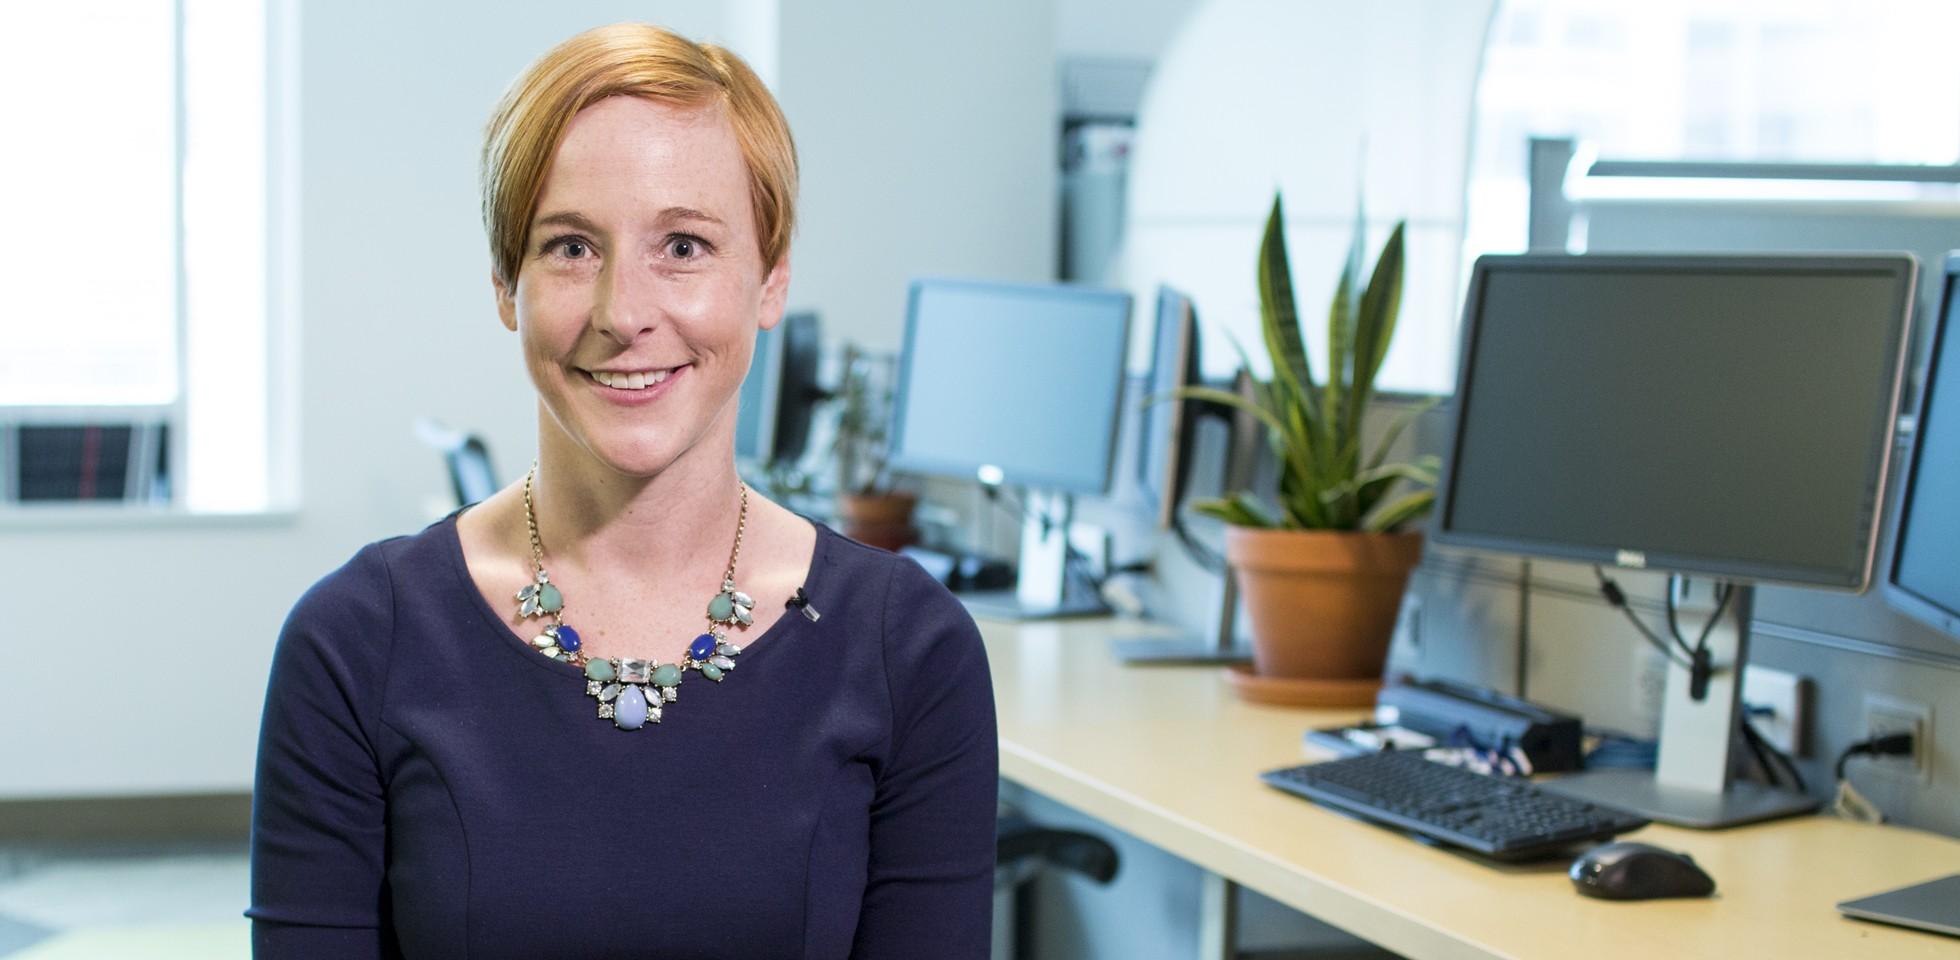 Kim Bailey, Program Officer, Science - PCORI Careers